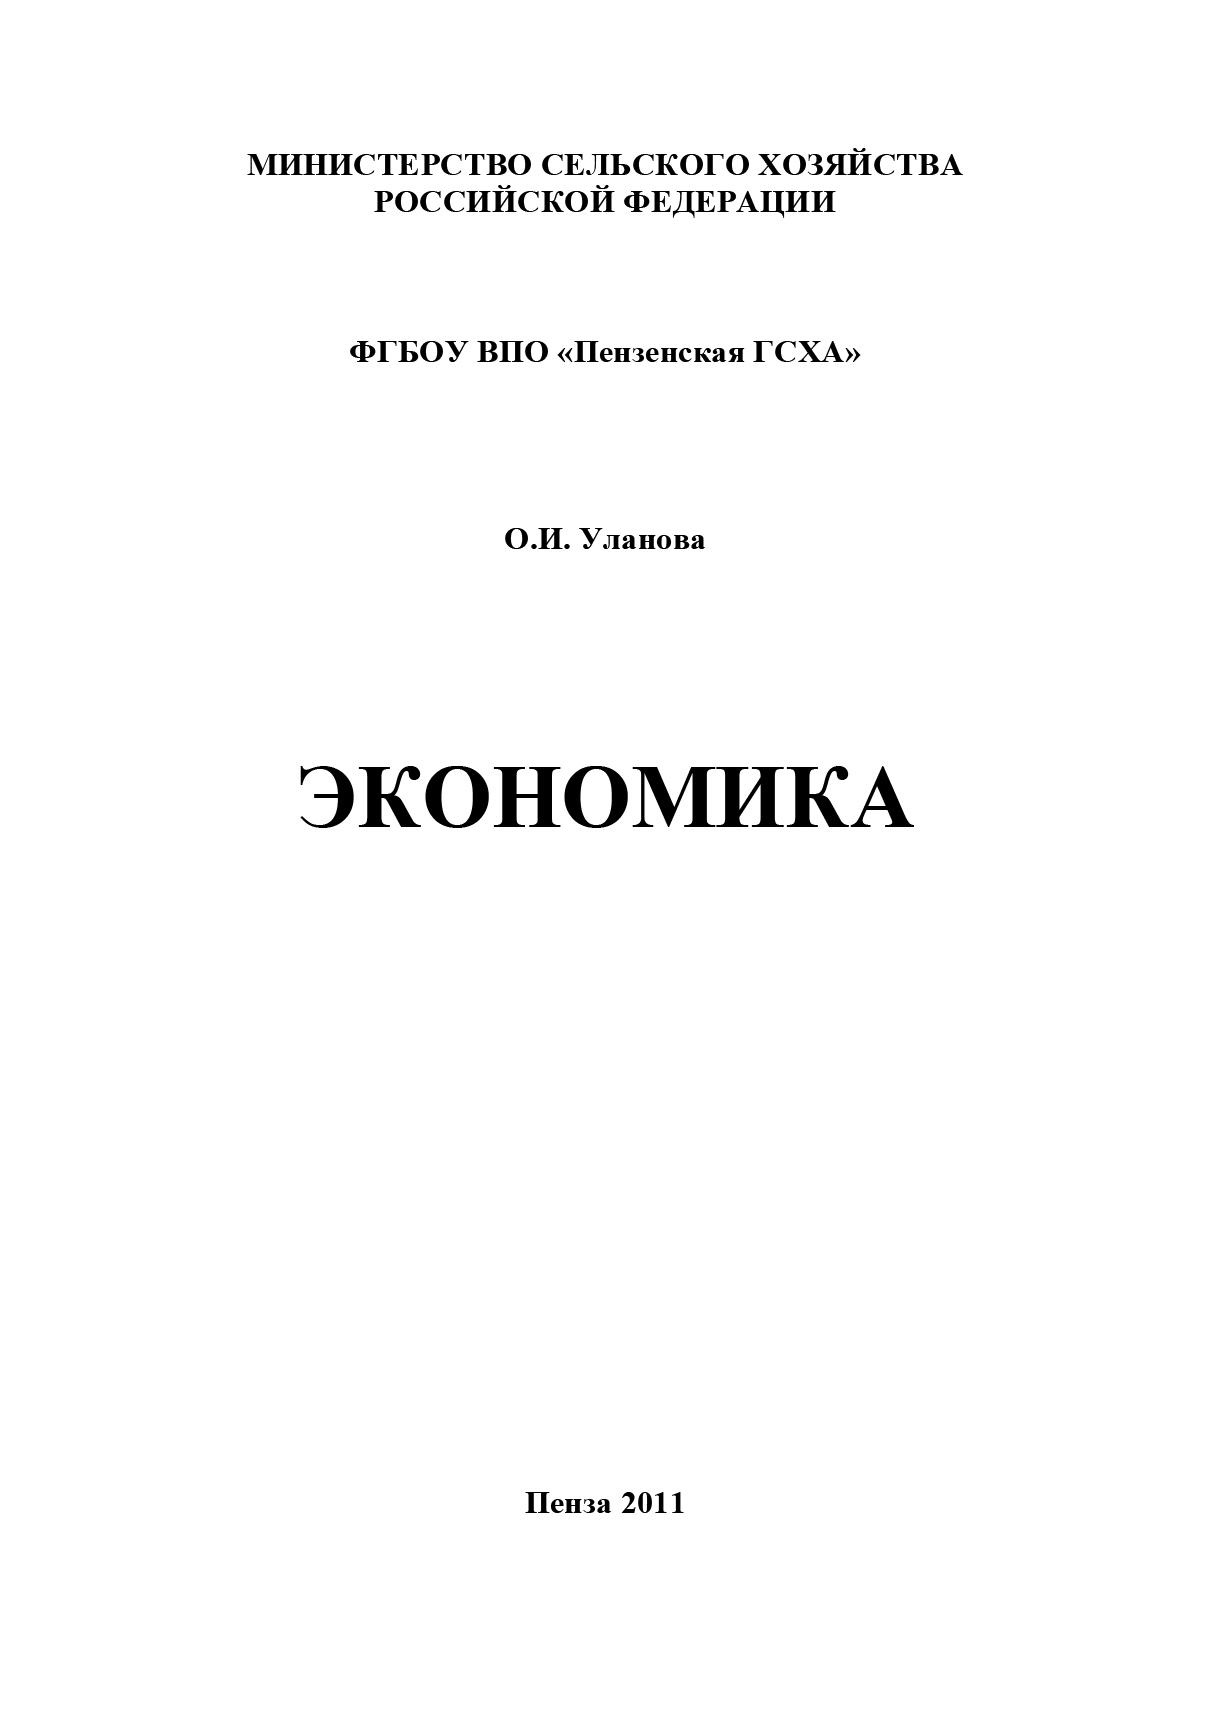 Вопрос 1 микроэкономика: предмет, объект, метод.